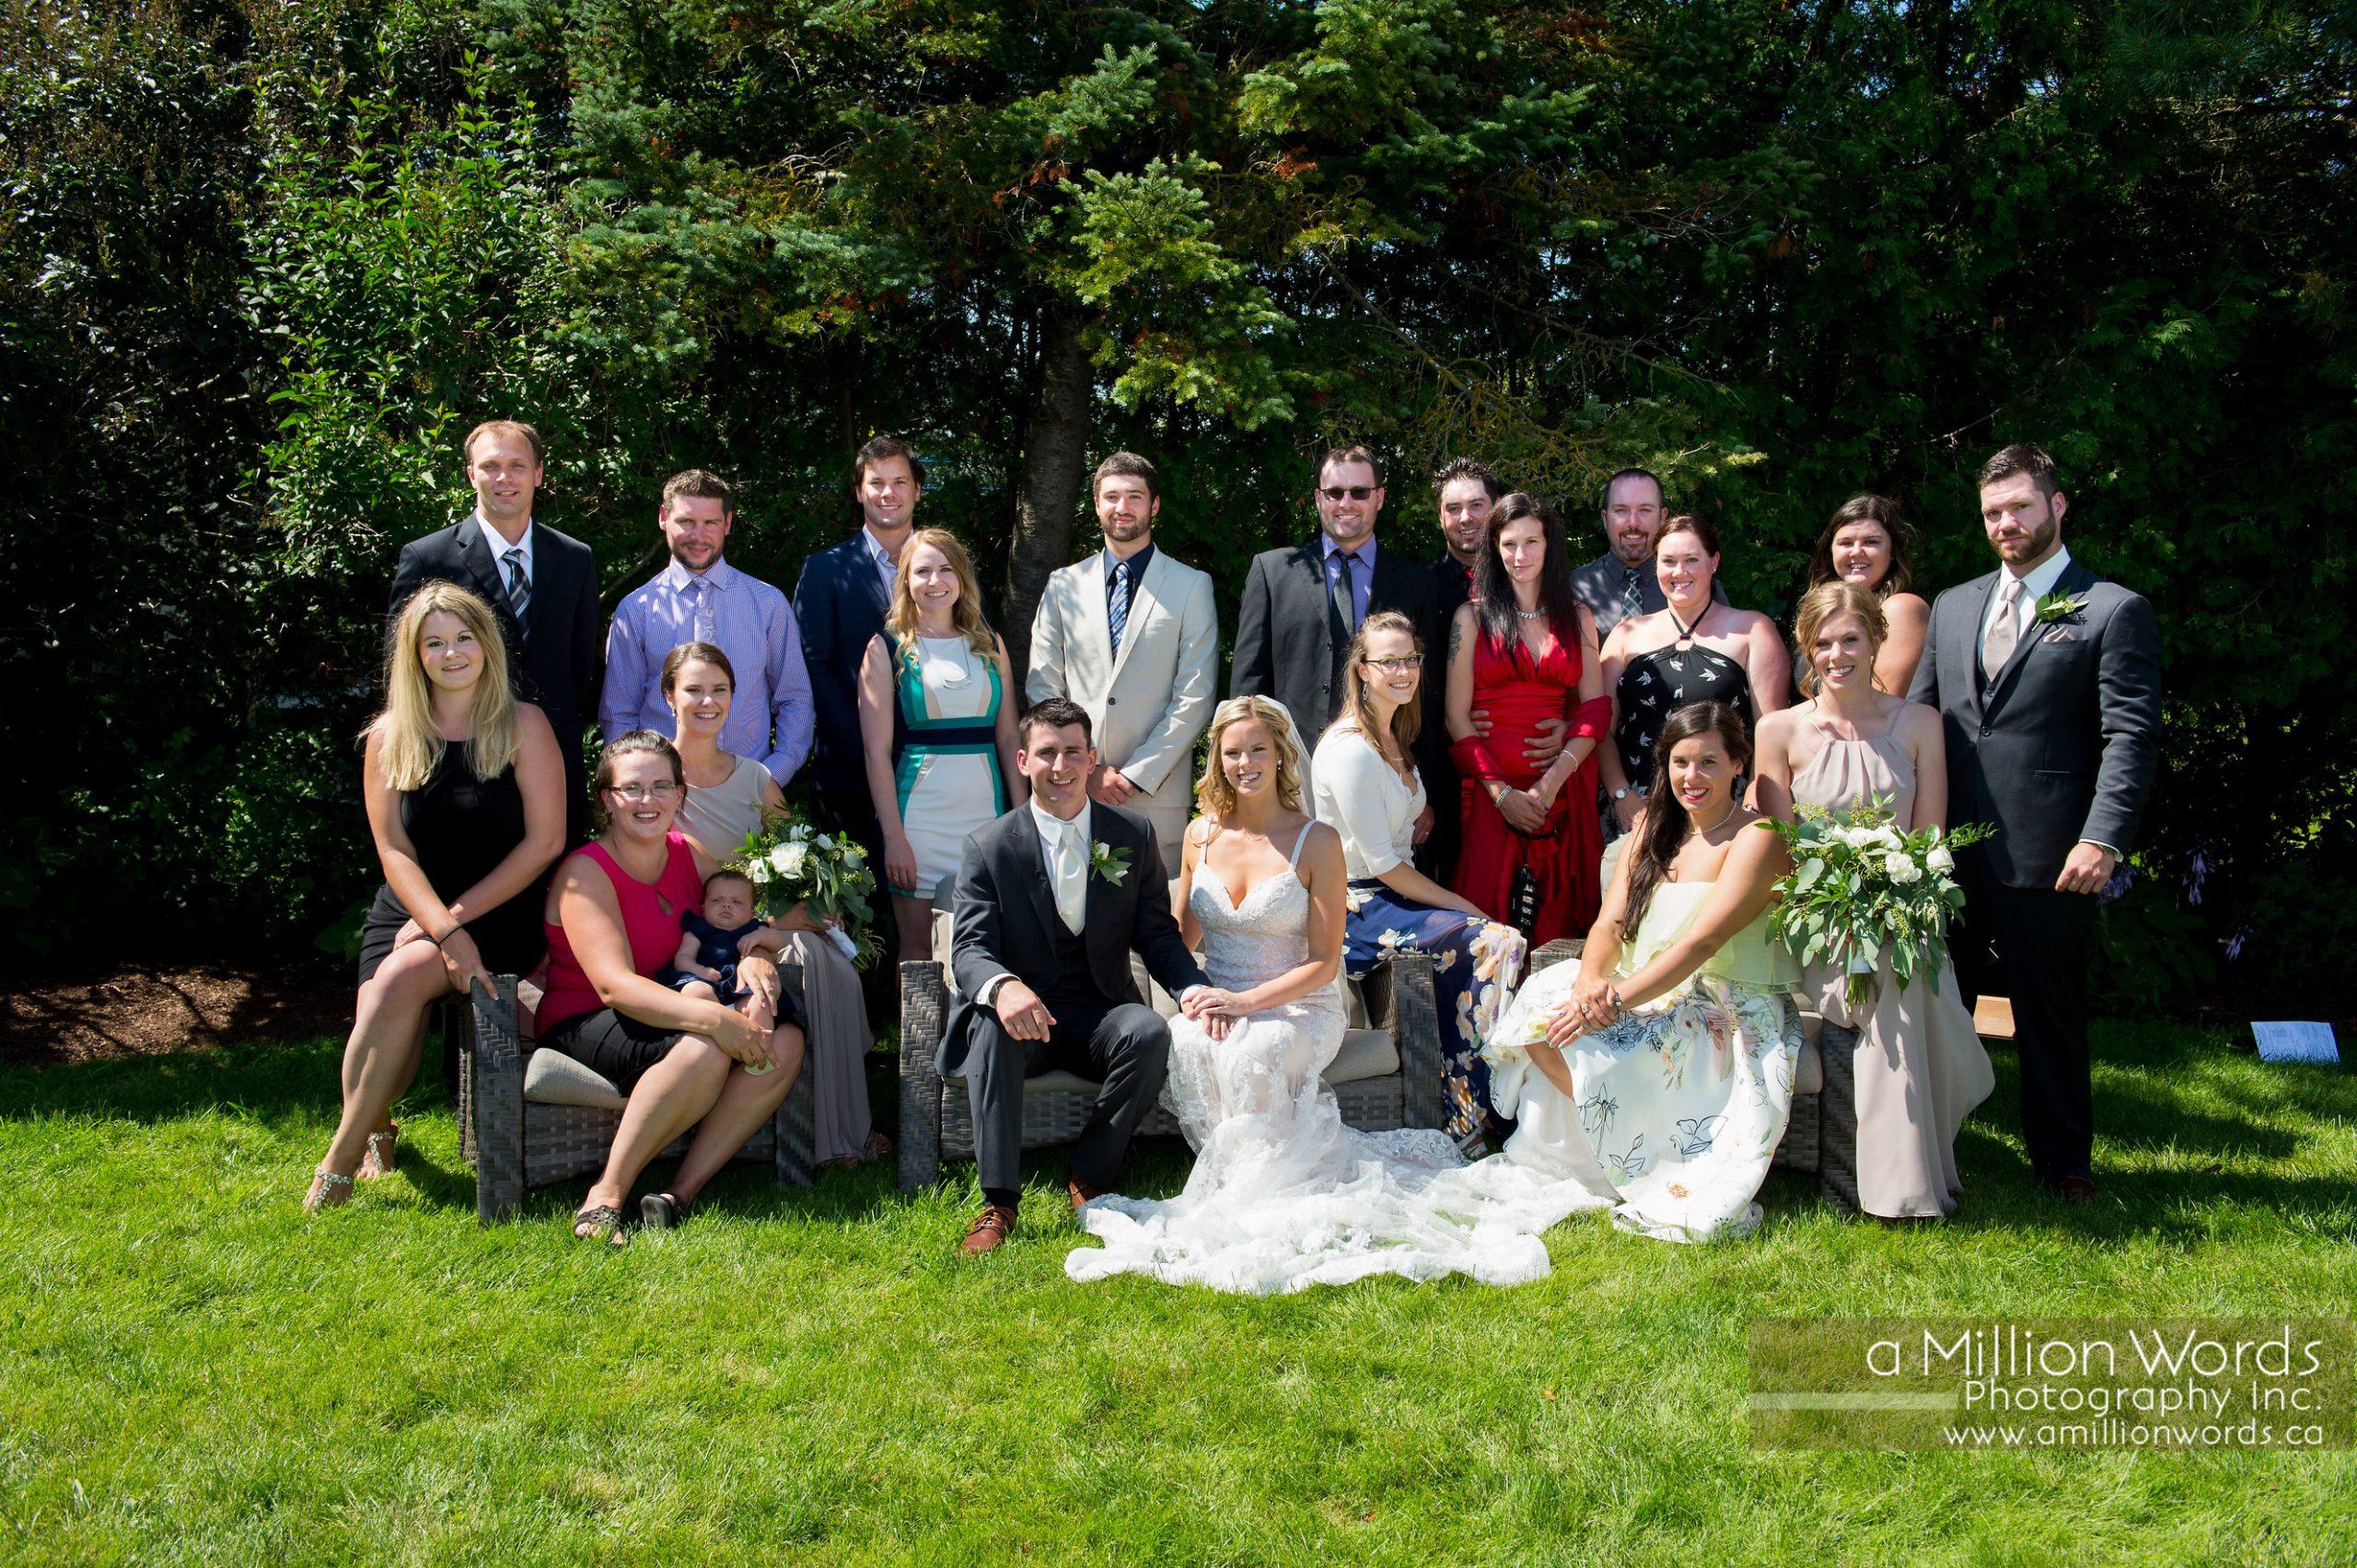 arthur_wedding_photographer40